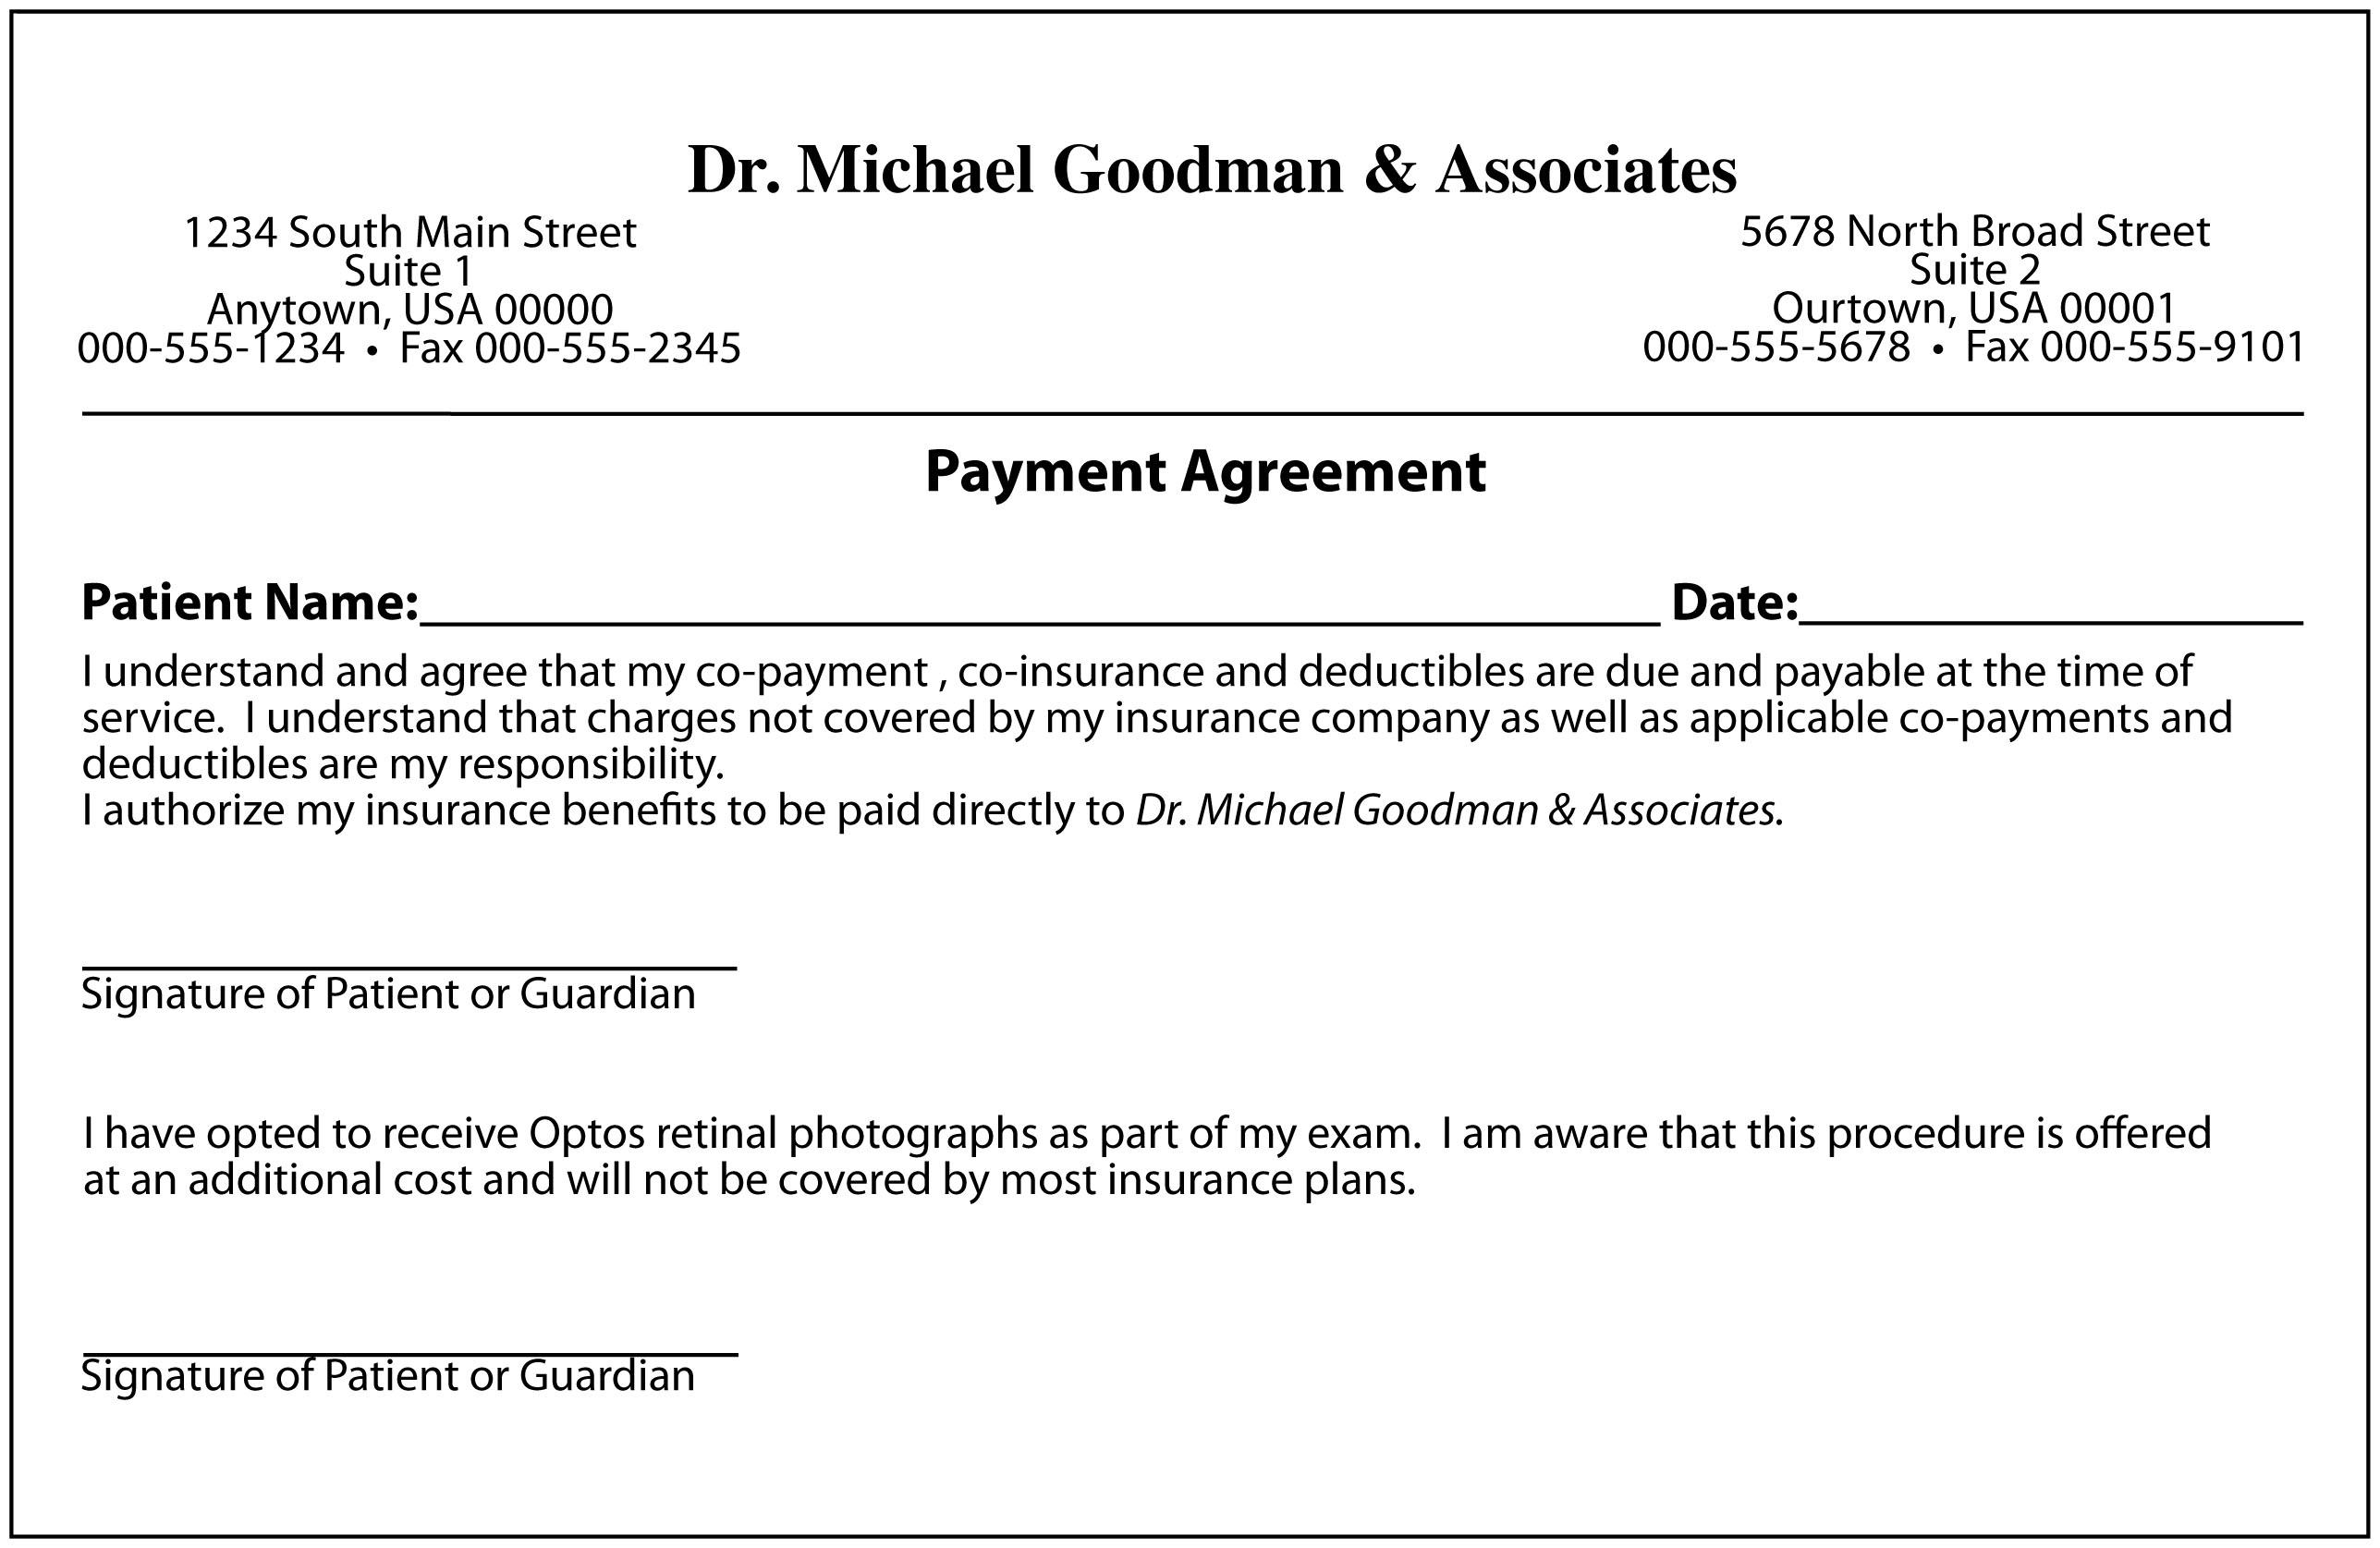 wage agreement template - keskes printing optometrists